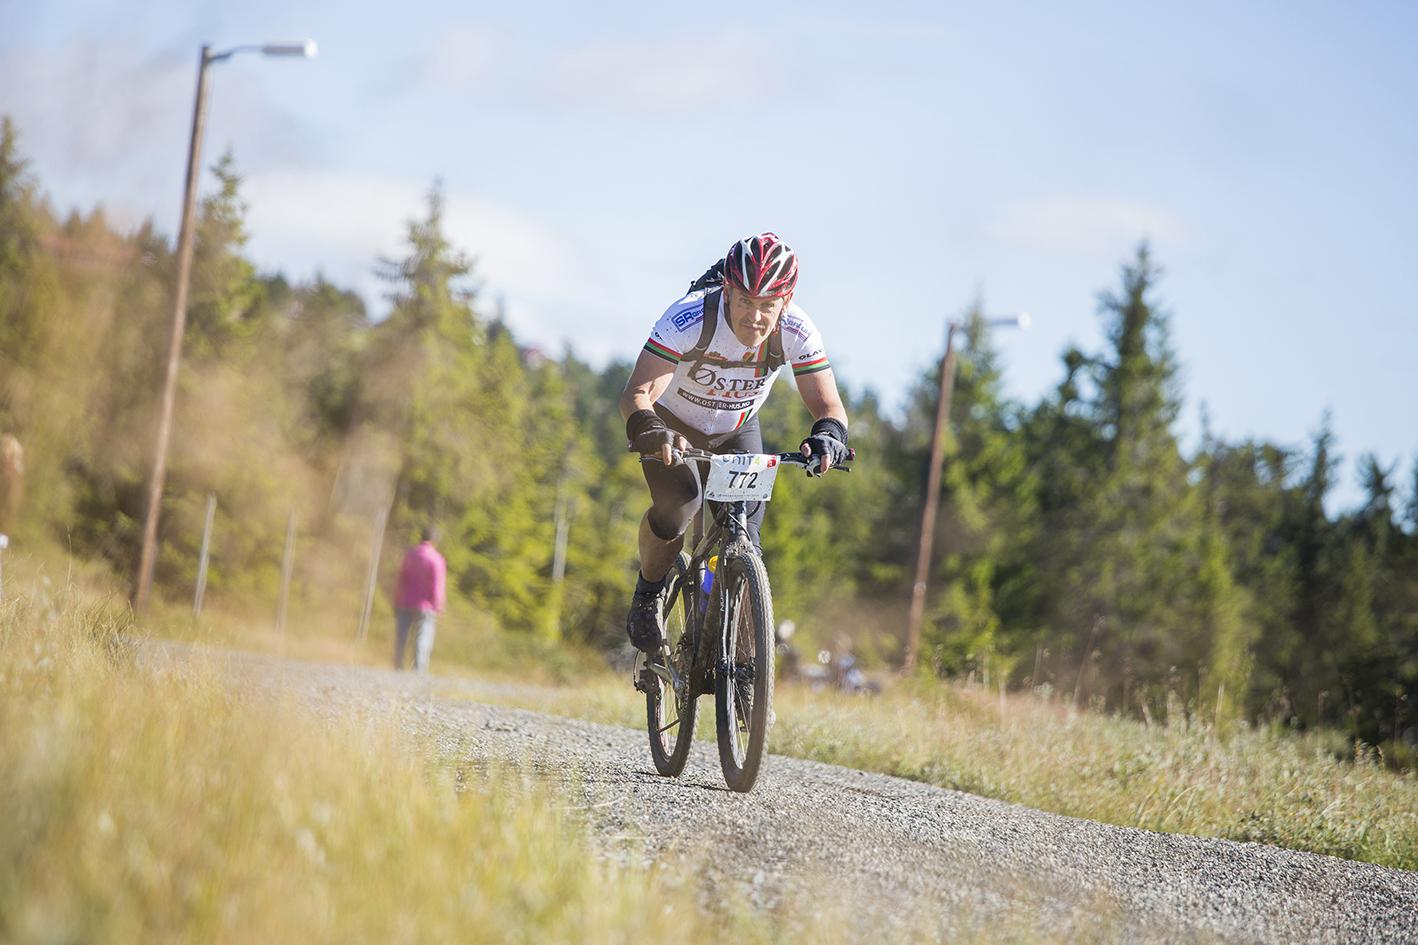 Birken sykkel 3.jpg